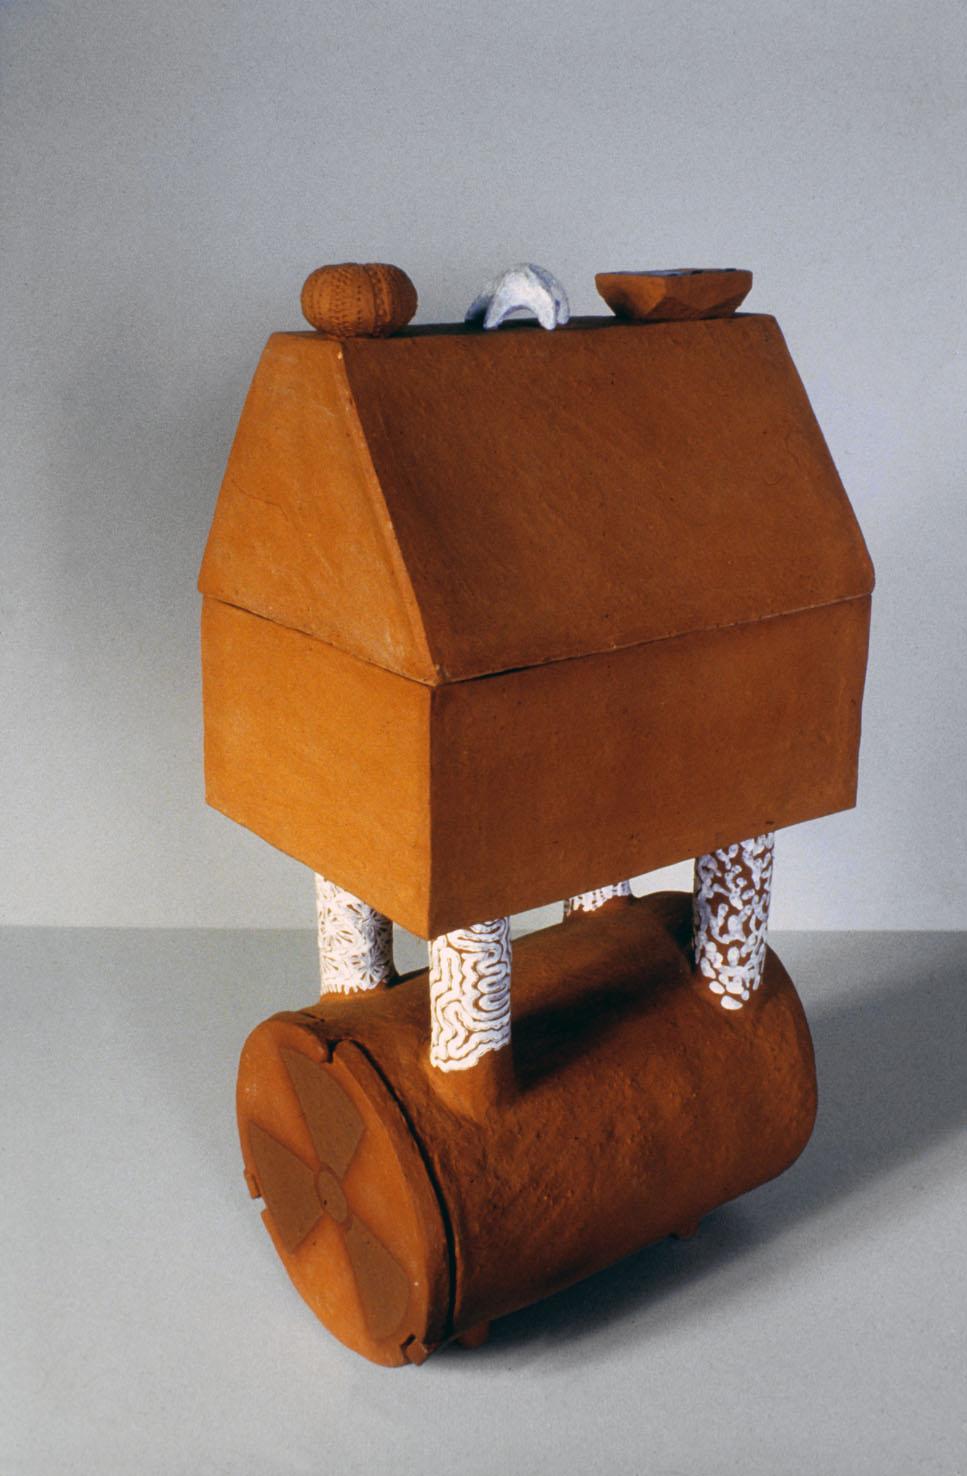 Toni Warburton, Bathurst Regional Art Gallery, public collection